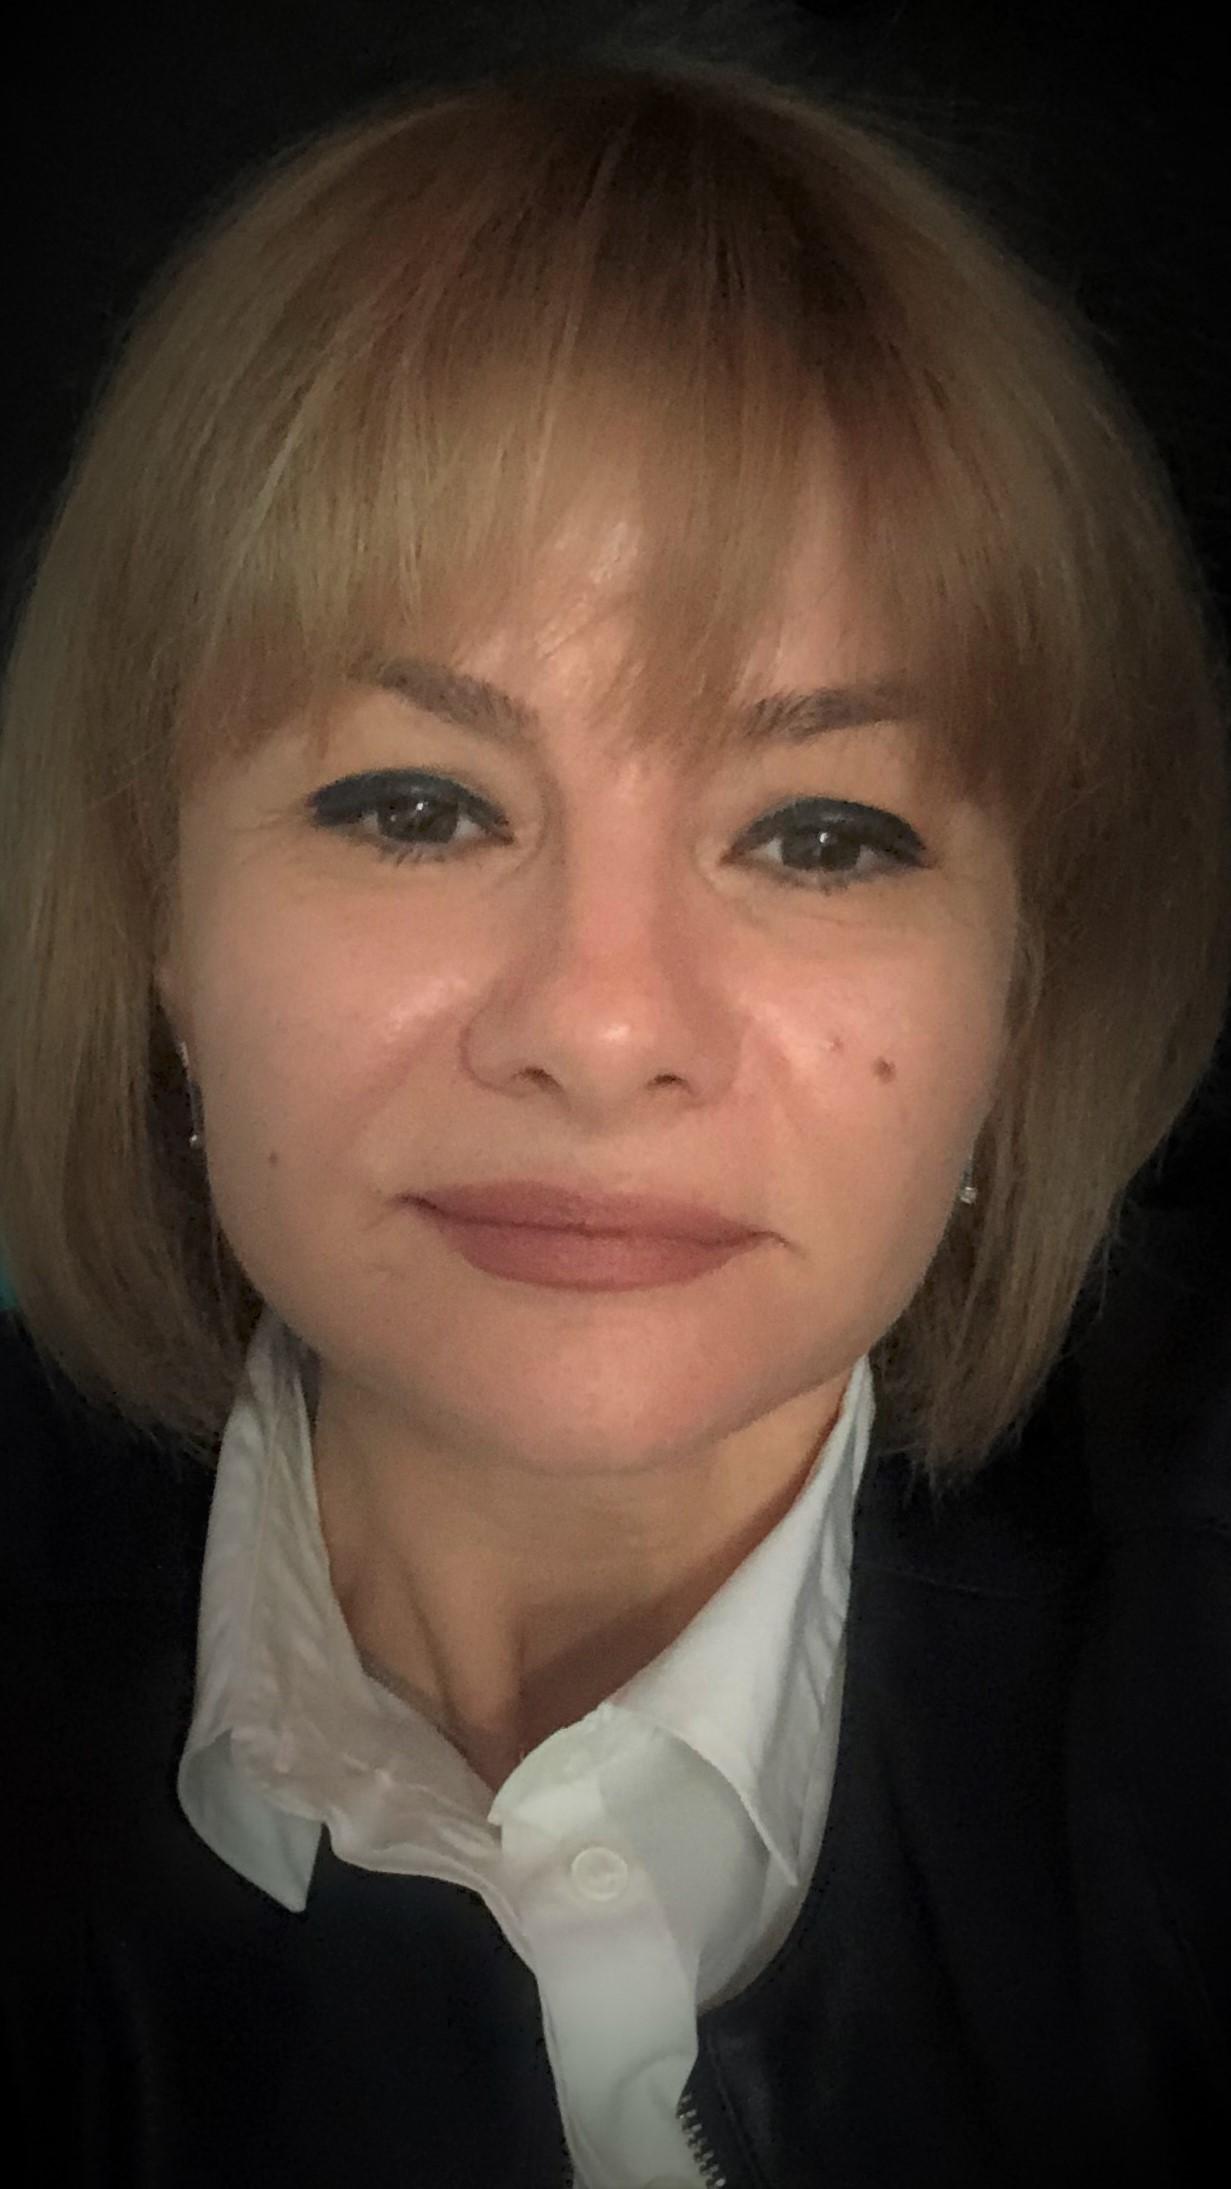 Silvia Cristina Macedon